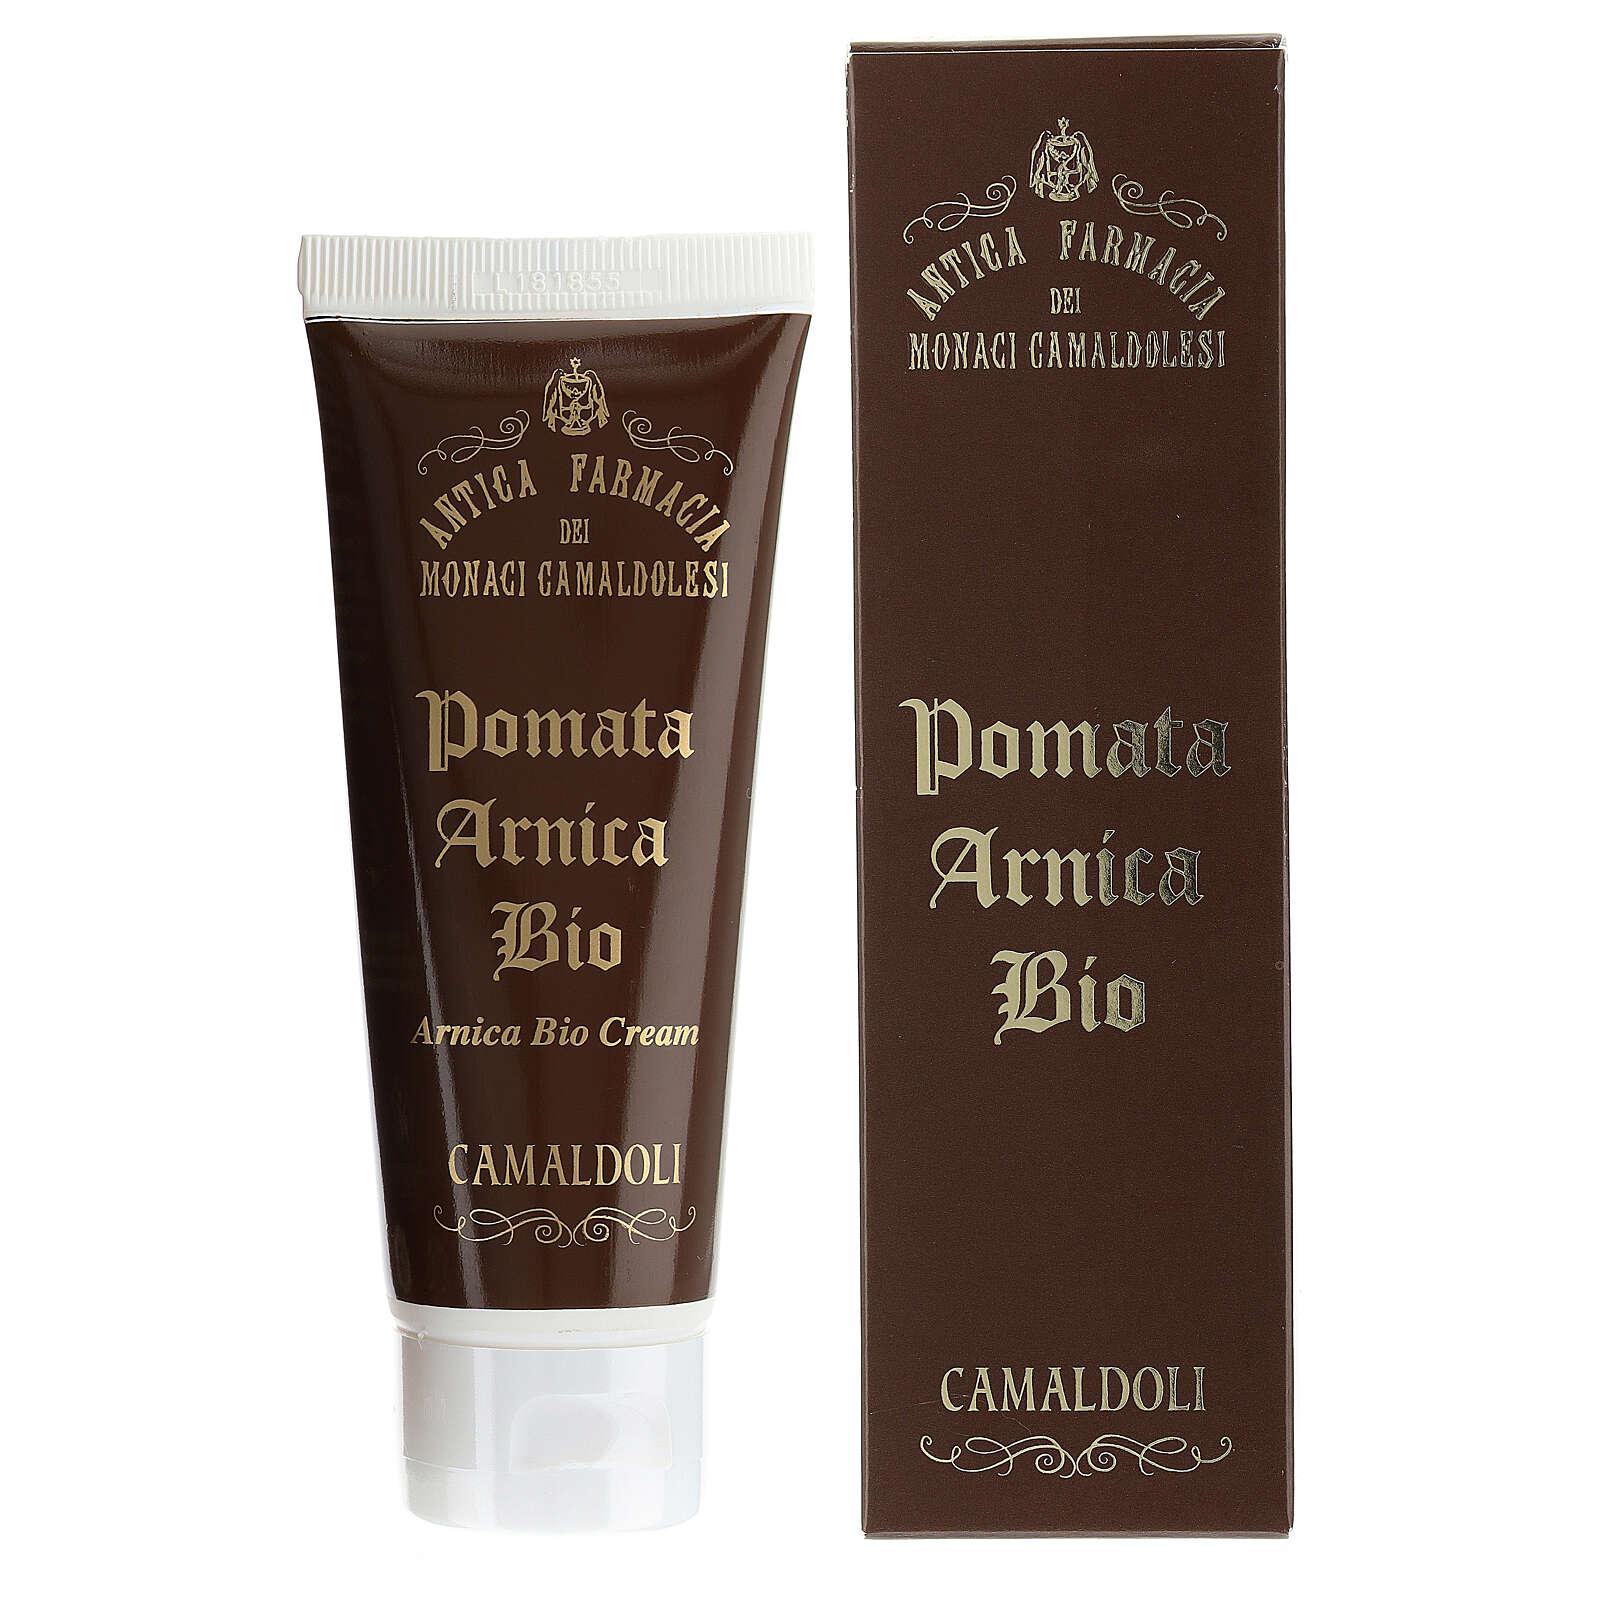 Pomata all'Arnica Bio BDIH 60 ml Camaldoli 4